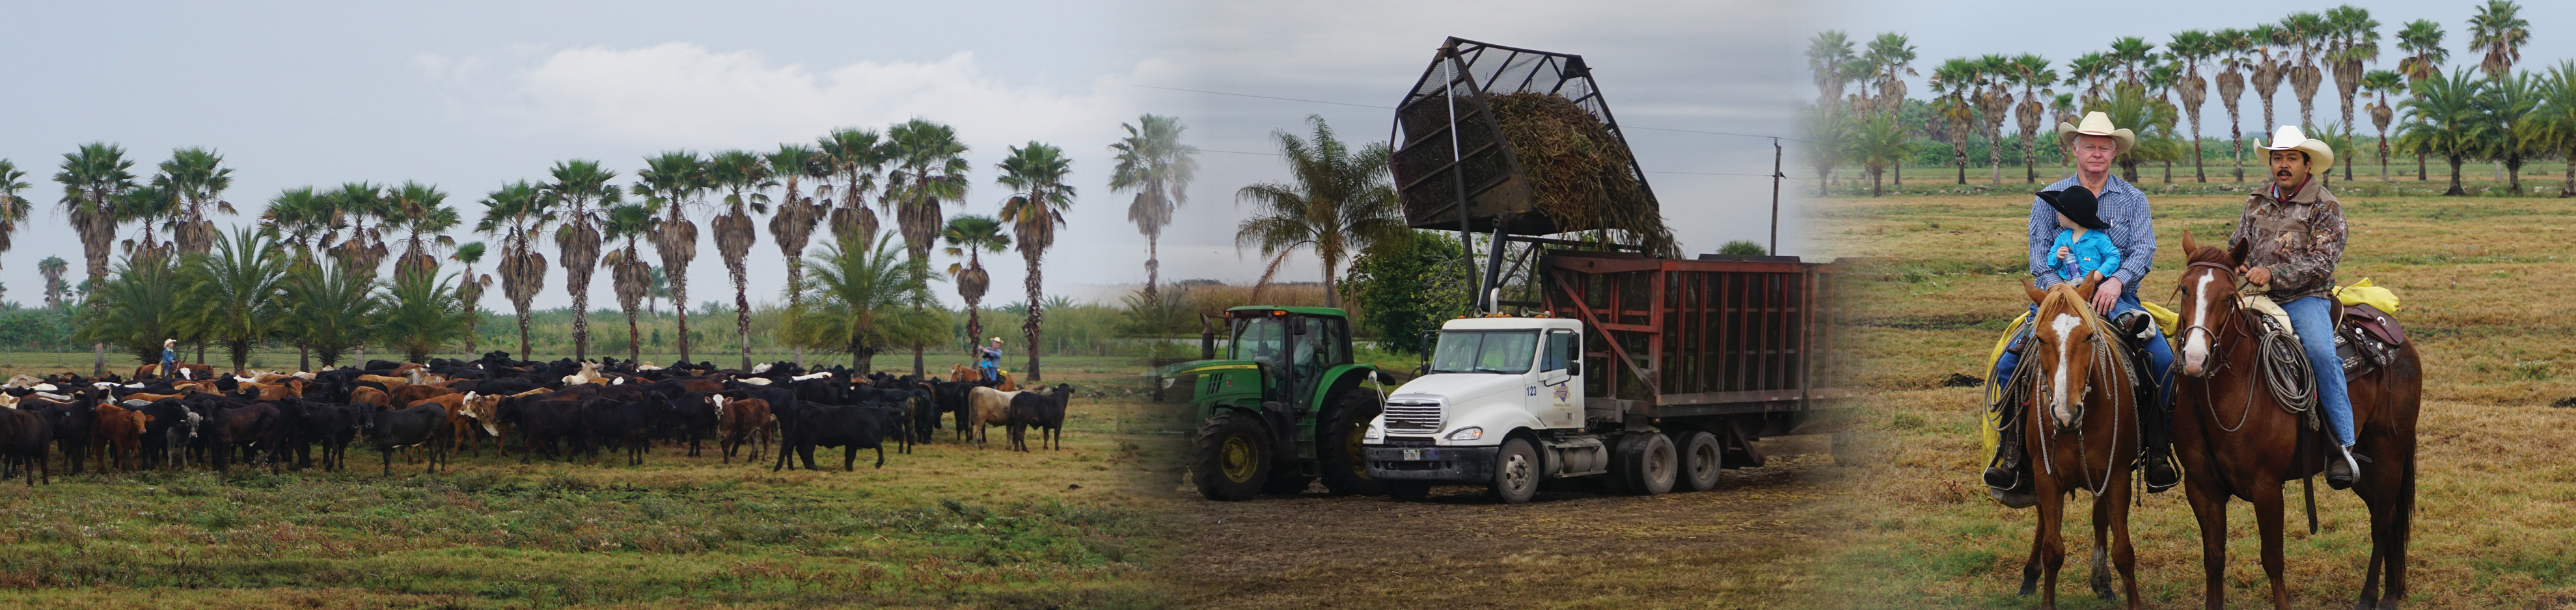 Agribusiness Minor